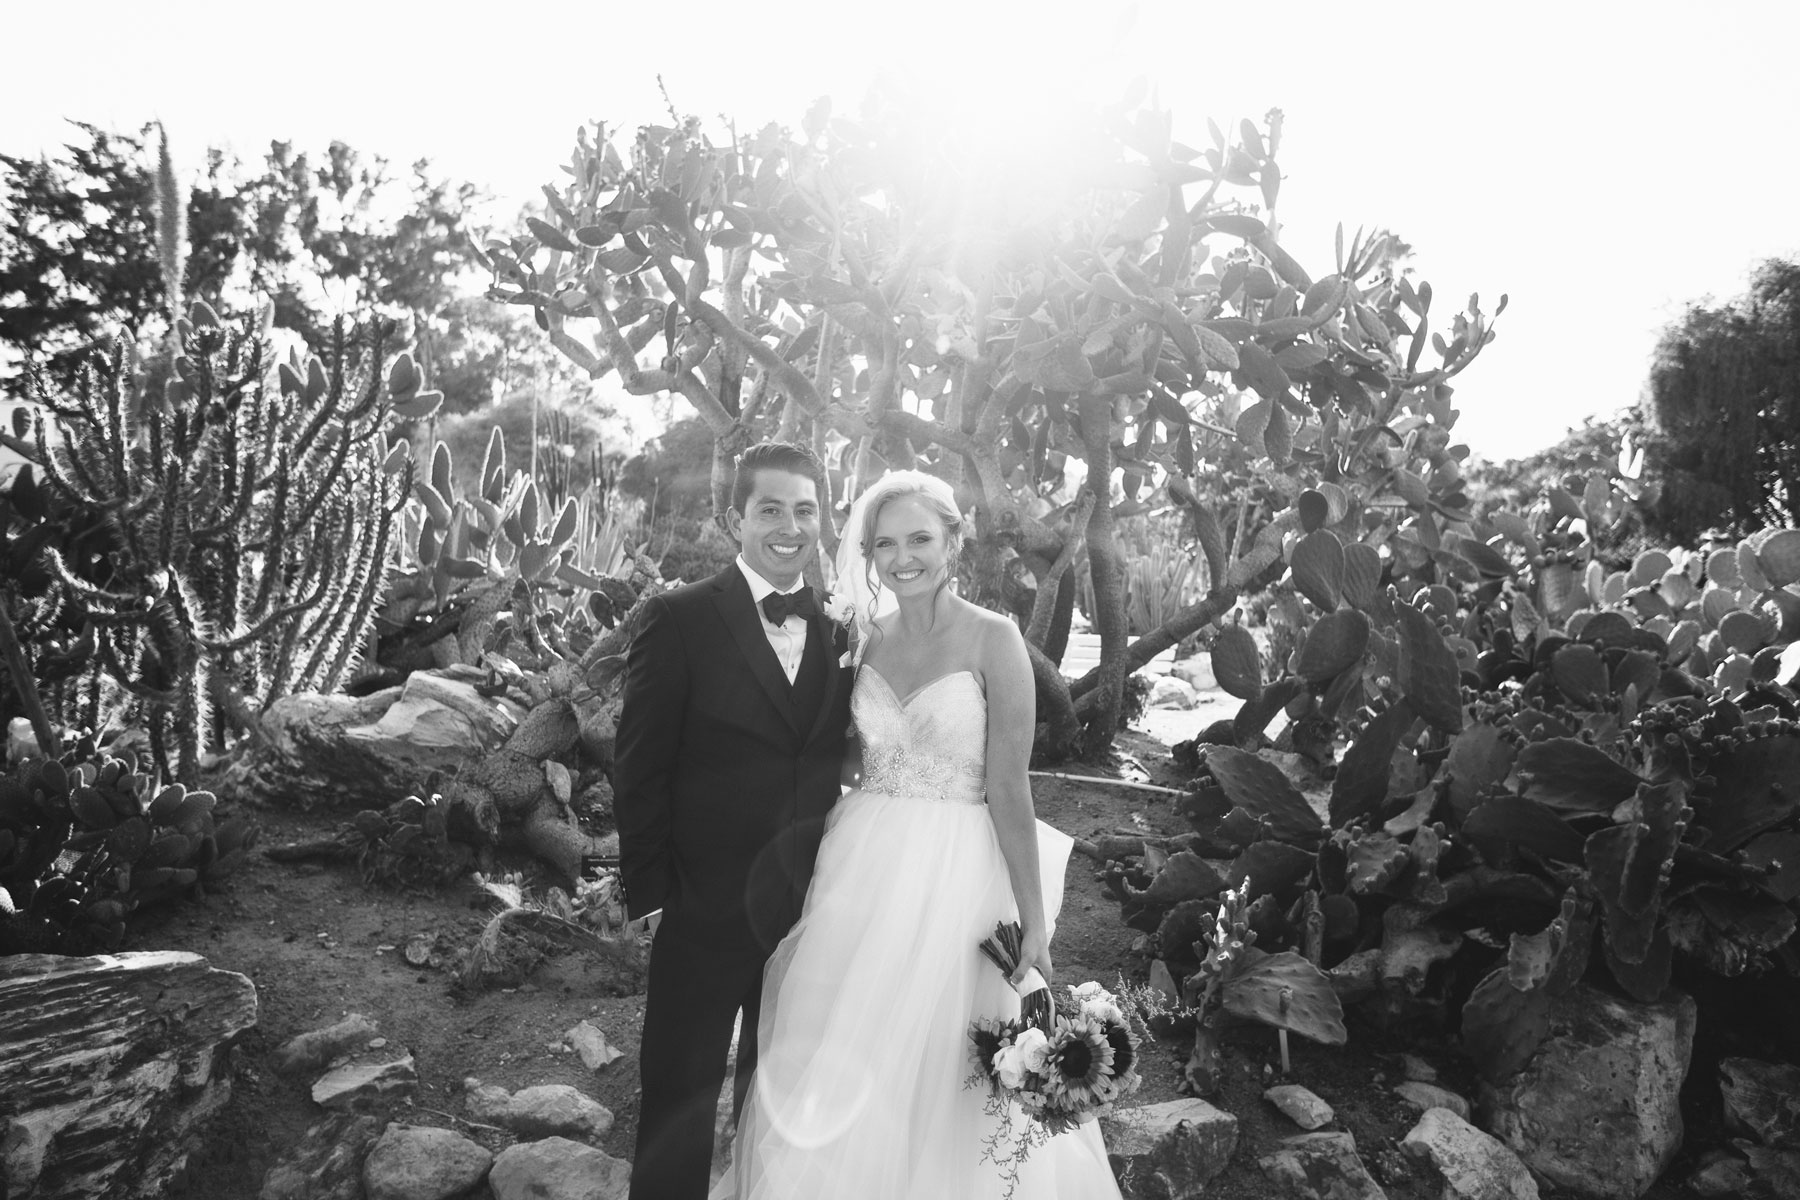 Wedding at the South Coast Botanical Gardens | Palos Verdes